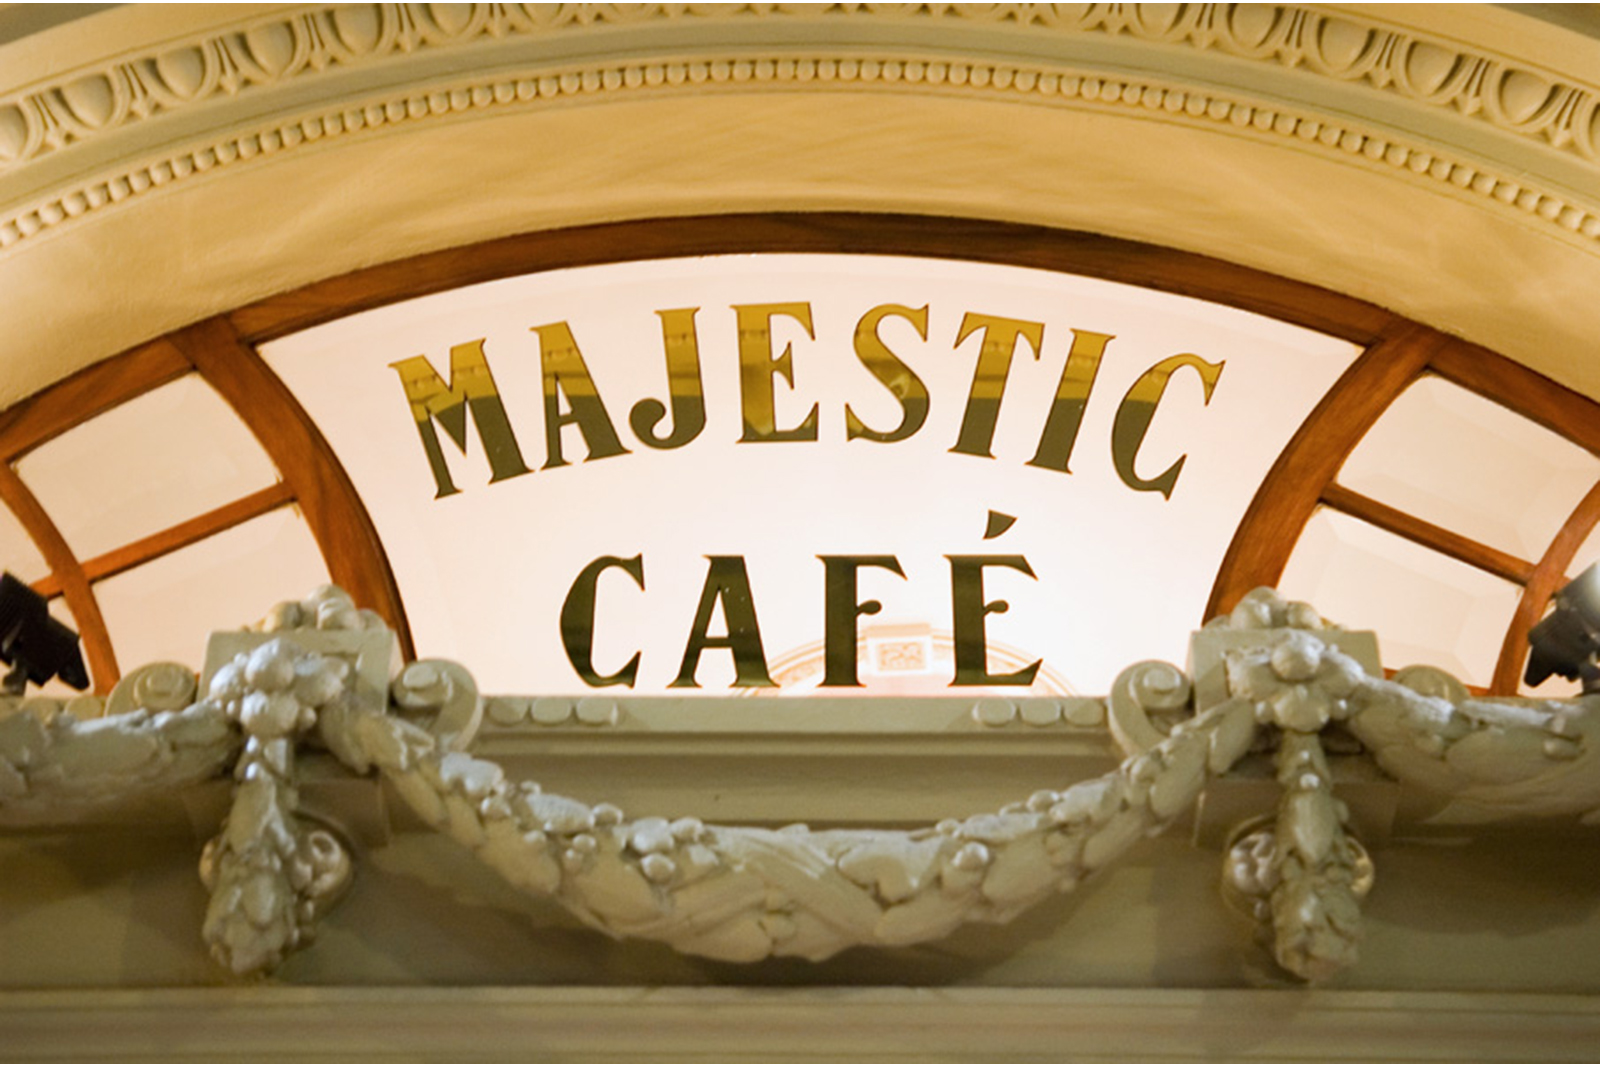 CAFE MAJESTIC